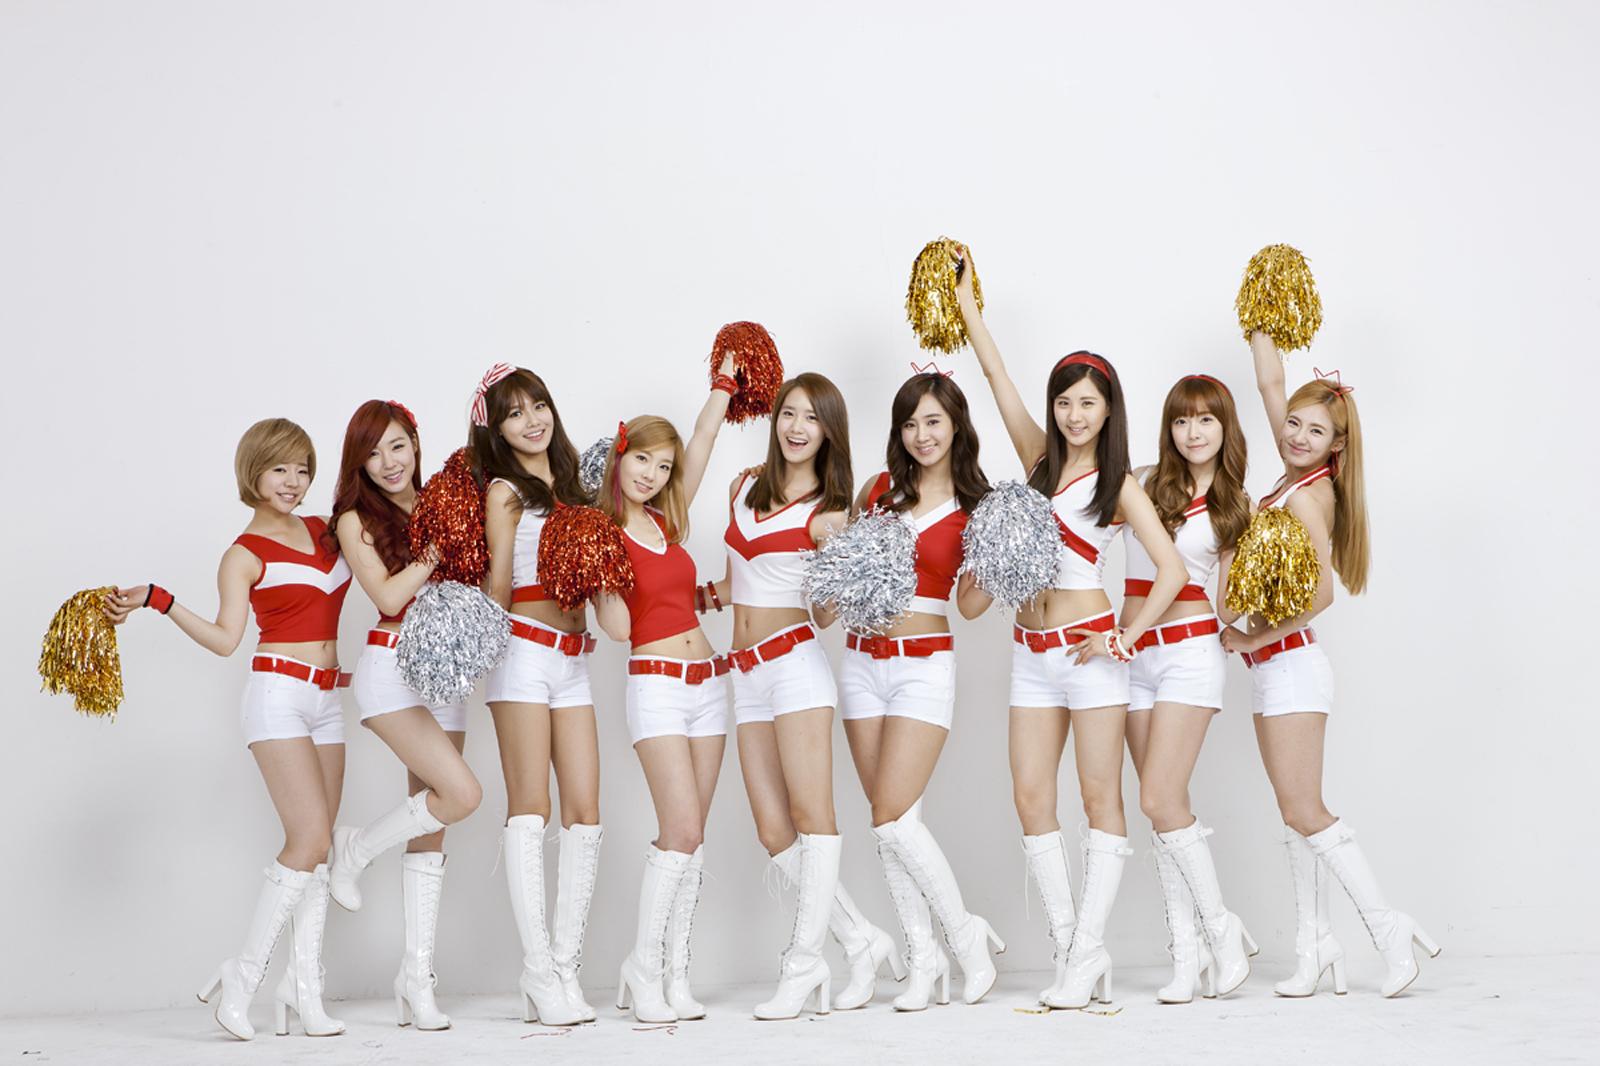 Girls' Generation 01 (edit: psychofriend.wordpress.com)